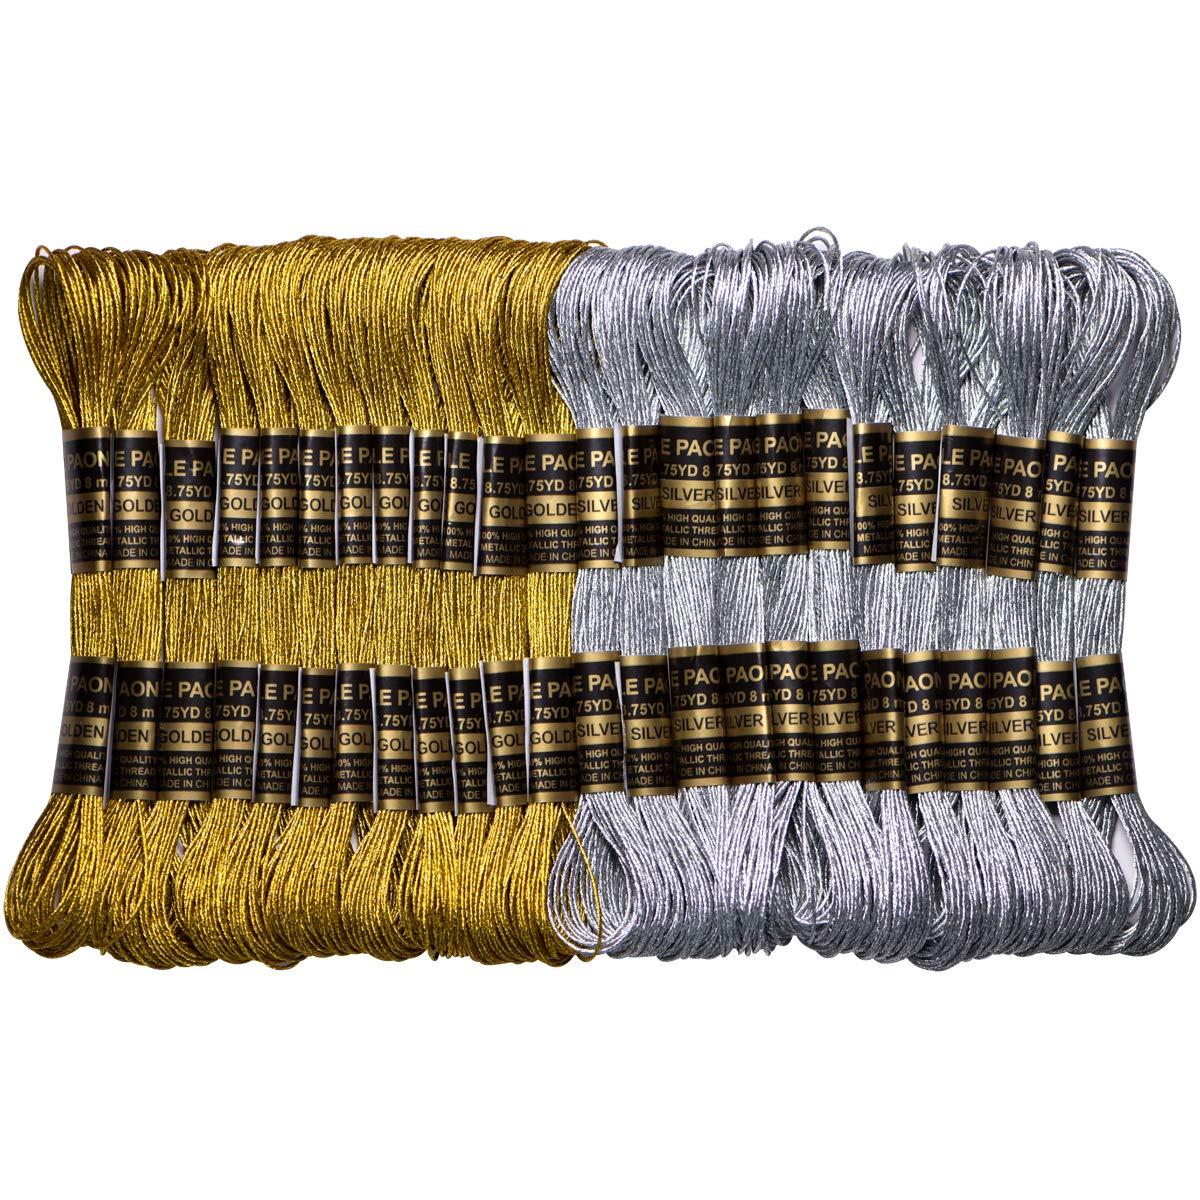 ThreadNanny Silver Metallic Machine Embroidery Threads 10000 yards